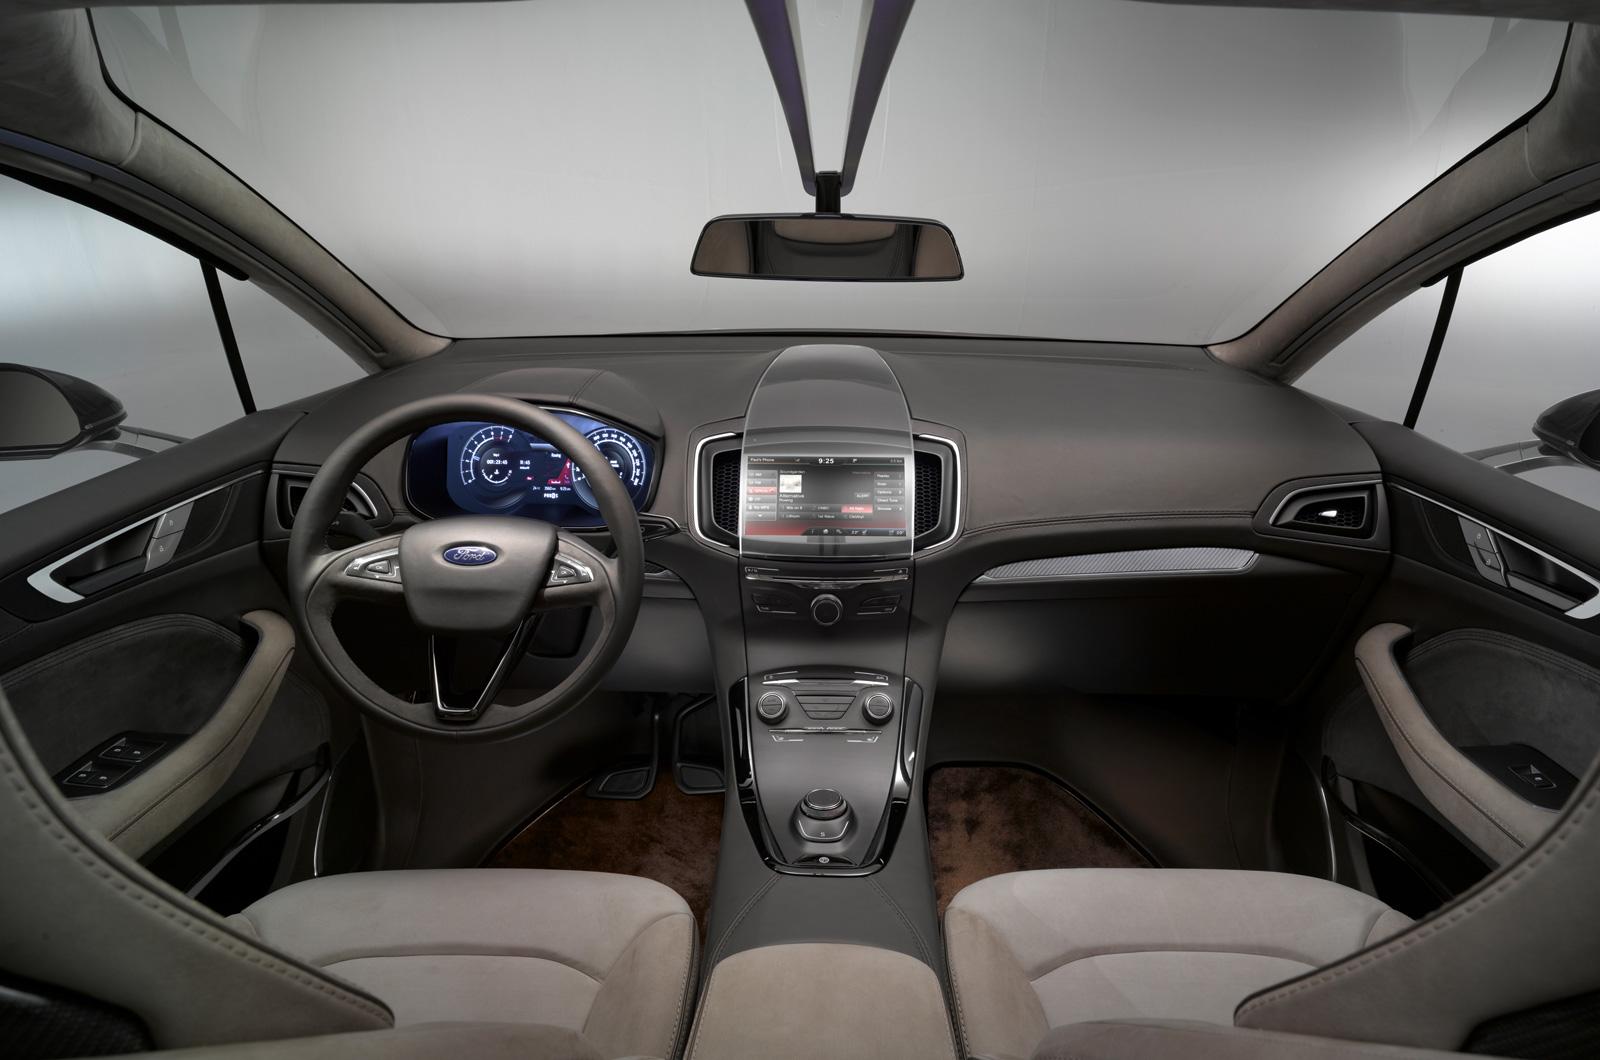 Ford S-Max Concept, la guía de diseño del futuro monovolumen